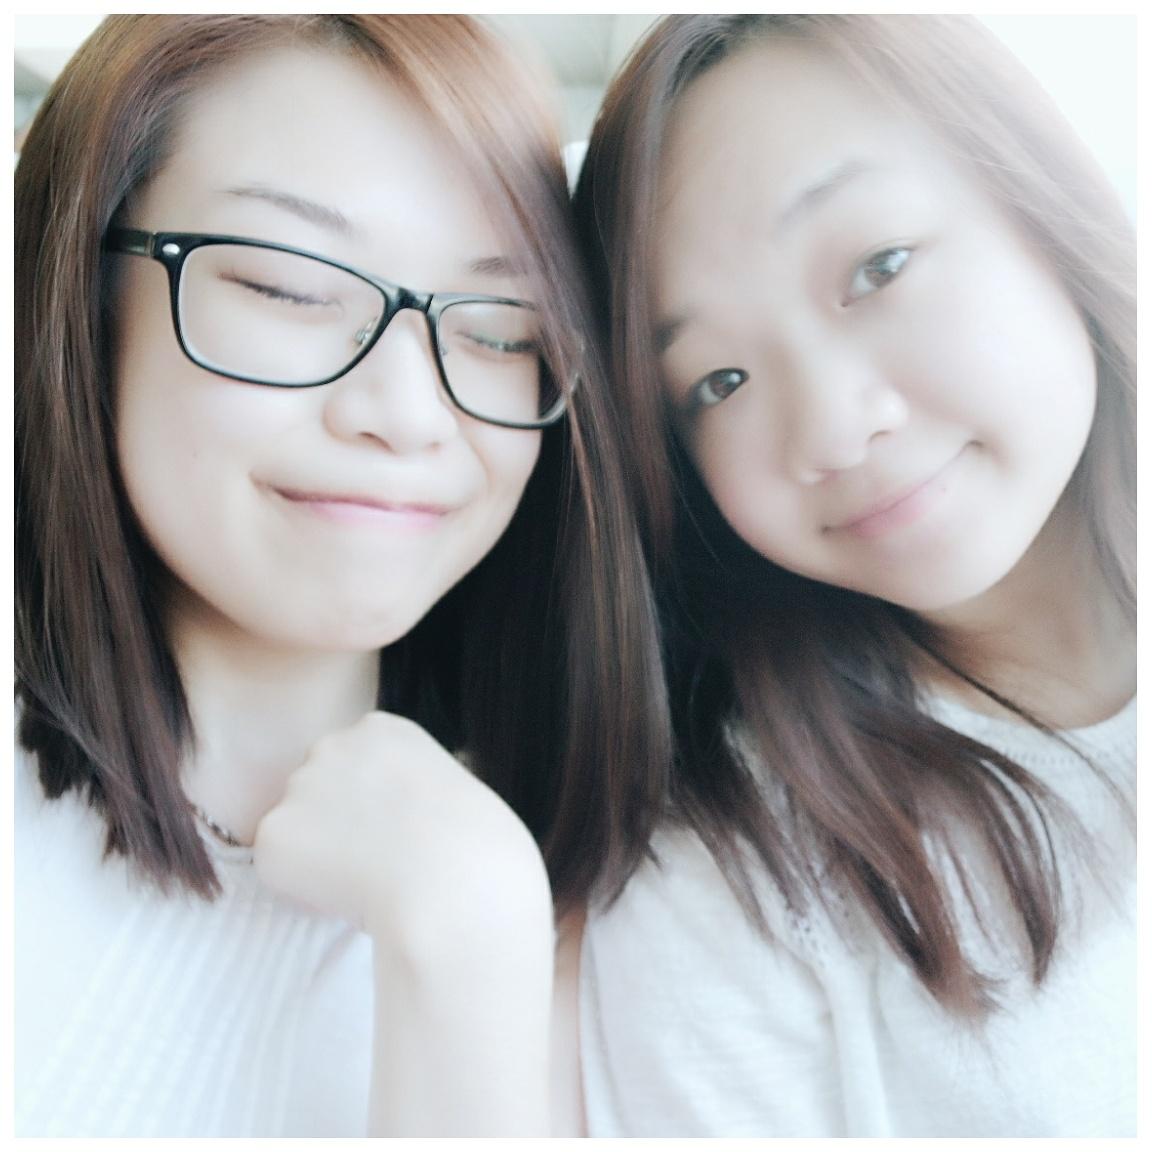 Daisybutter - Hong Kong Lifestyle and Fashion Blog: